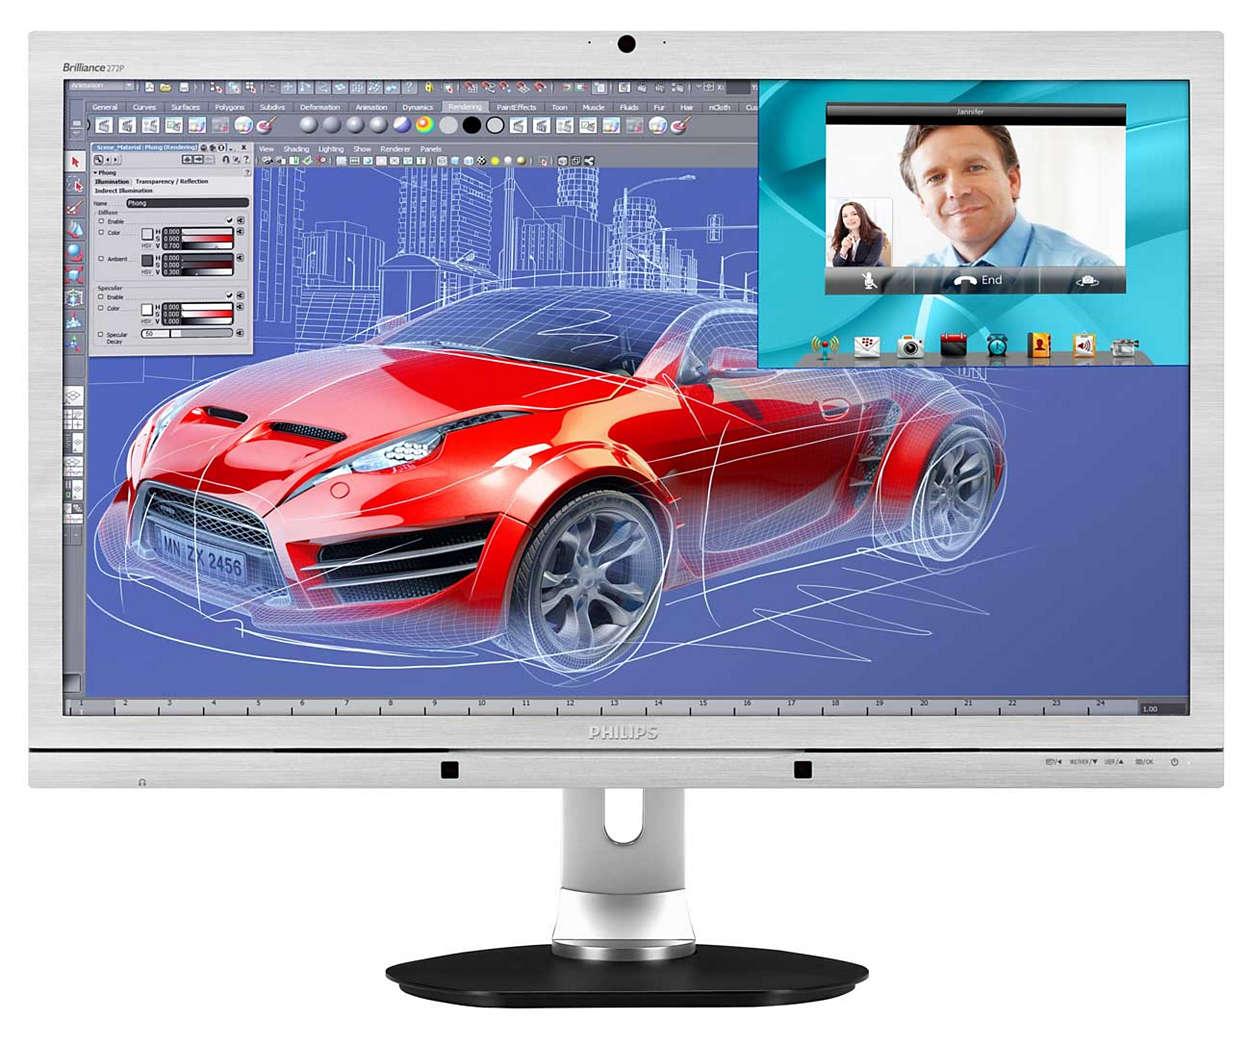 Crystalclear images, maximum productivity